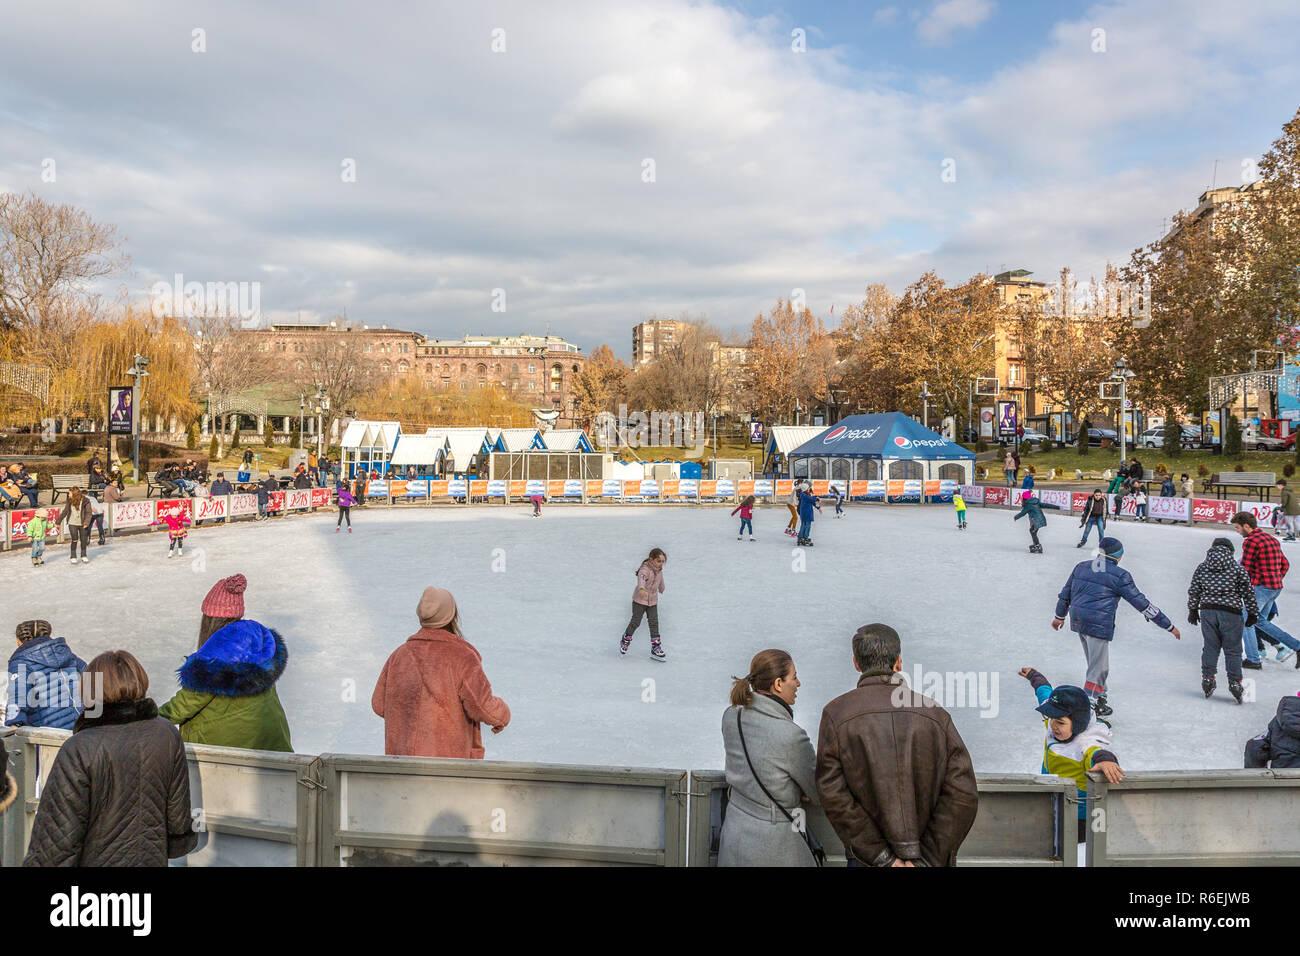 Yerevan, Armenia - Jan 8th 2018 - Tourists and locals enjoying an ice-skating park in Yerevan, winter time in Armenia Stock Photo